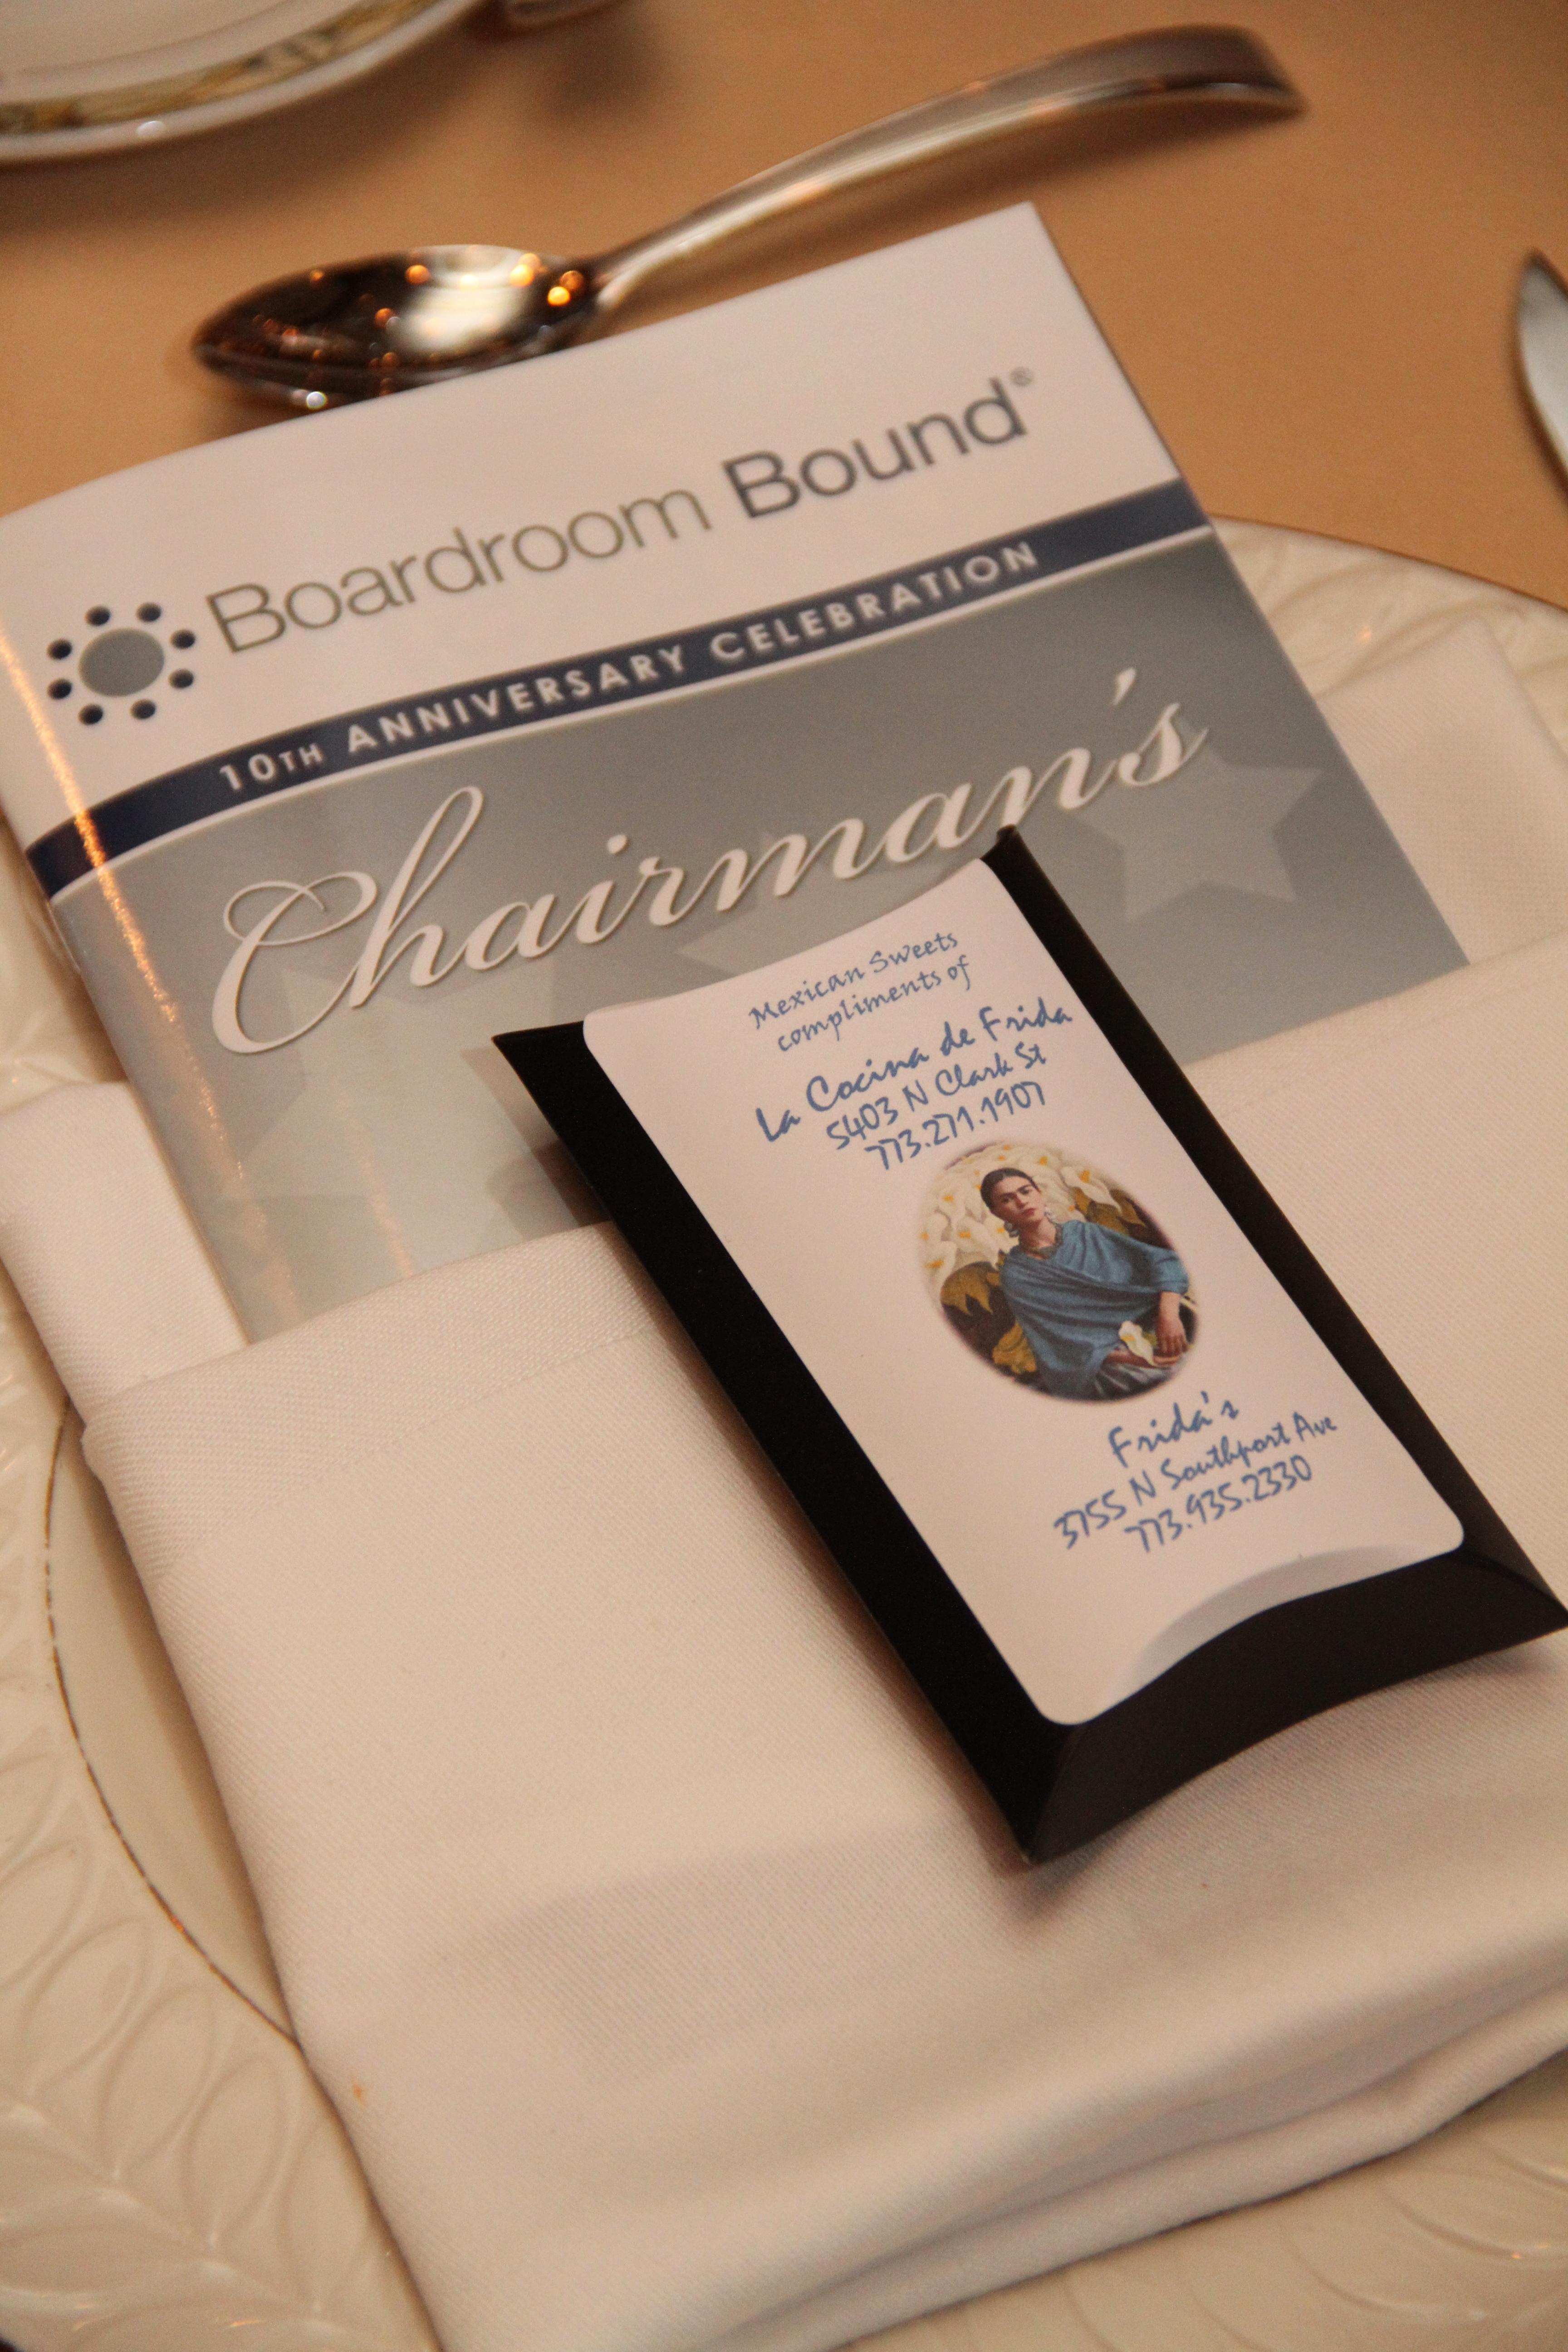 boardroomboundball-a003